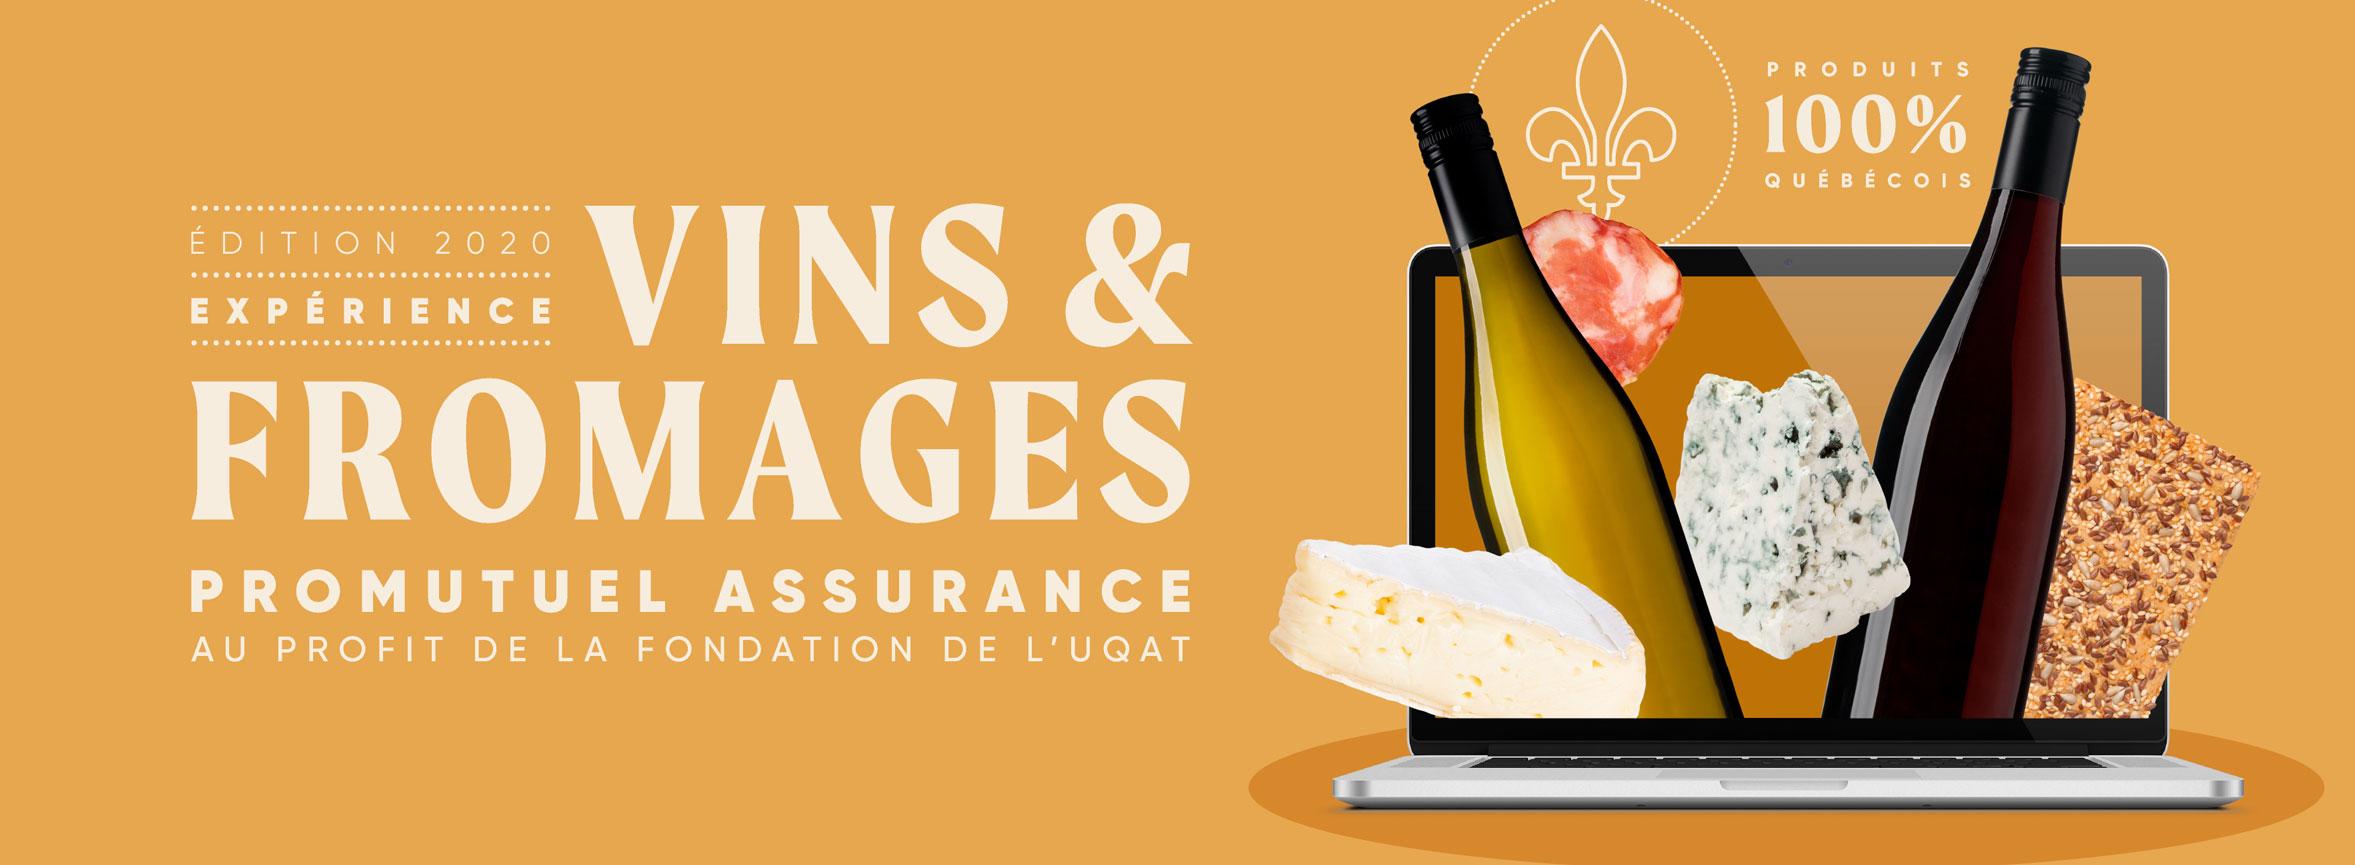 Fuqat_vins_fromages